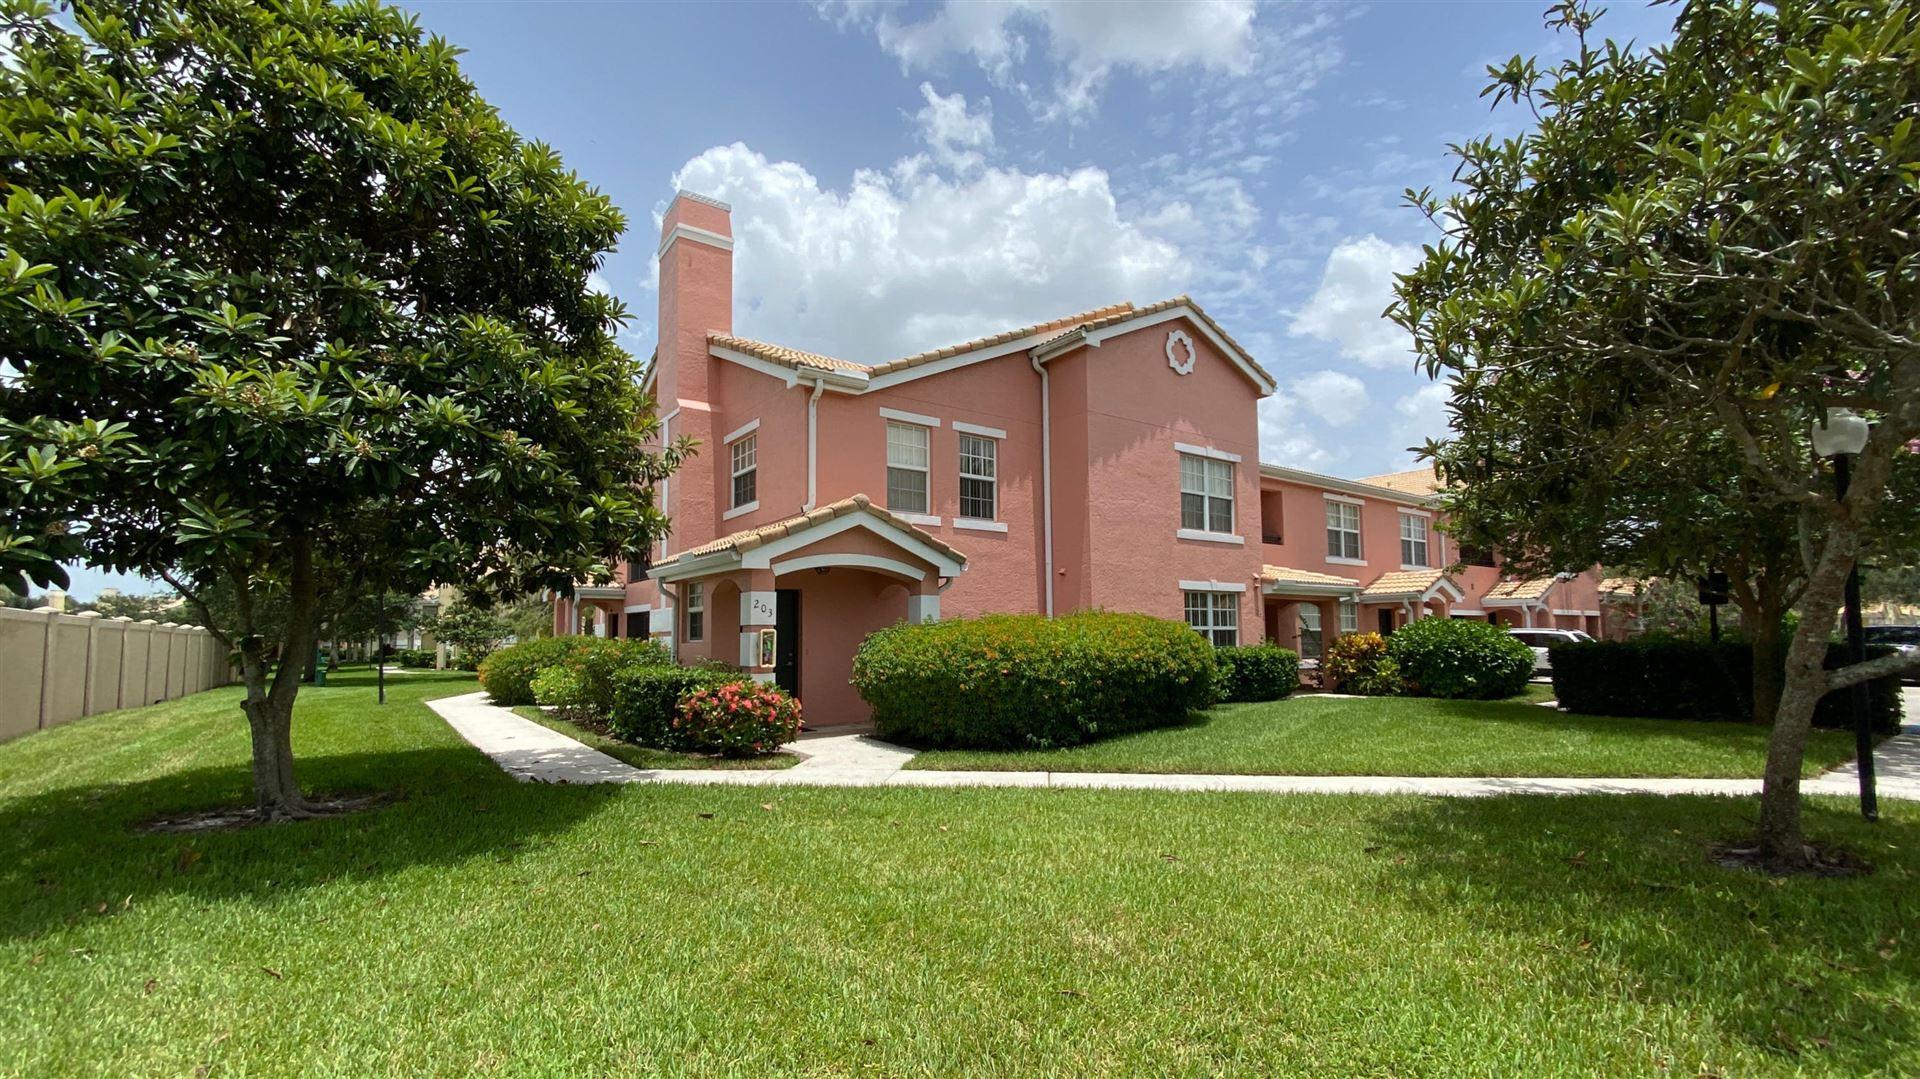 162 SW Peacock Boulevard #32-203, Port Saint Lucie, FL 34986 - #: RX-10635037